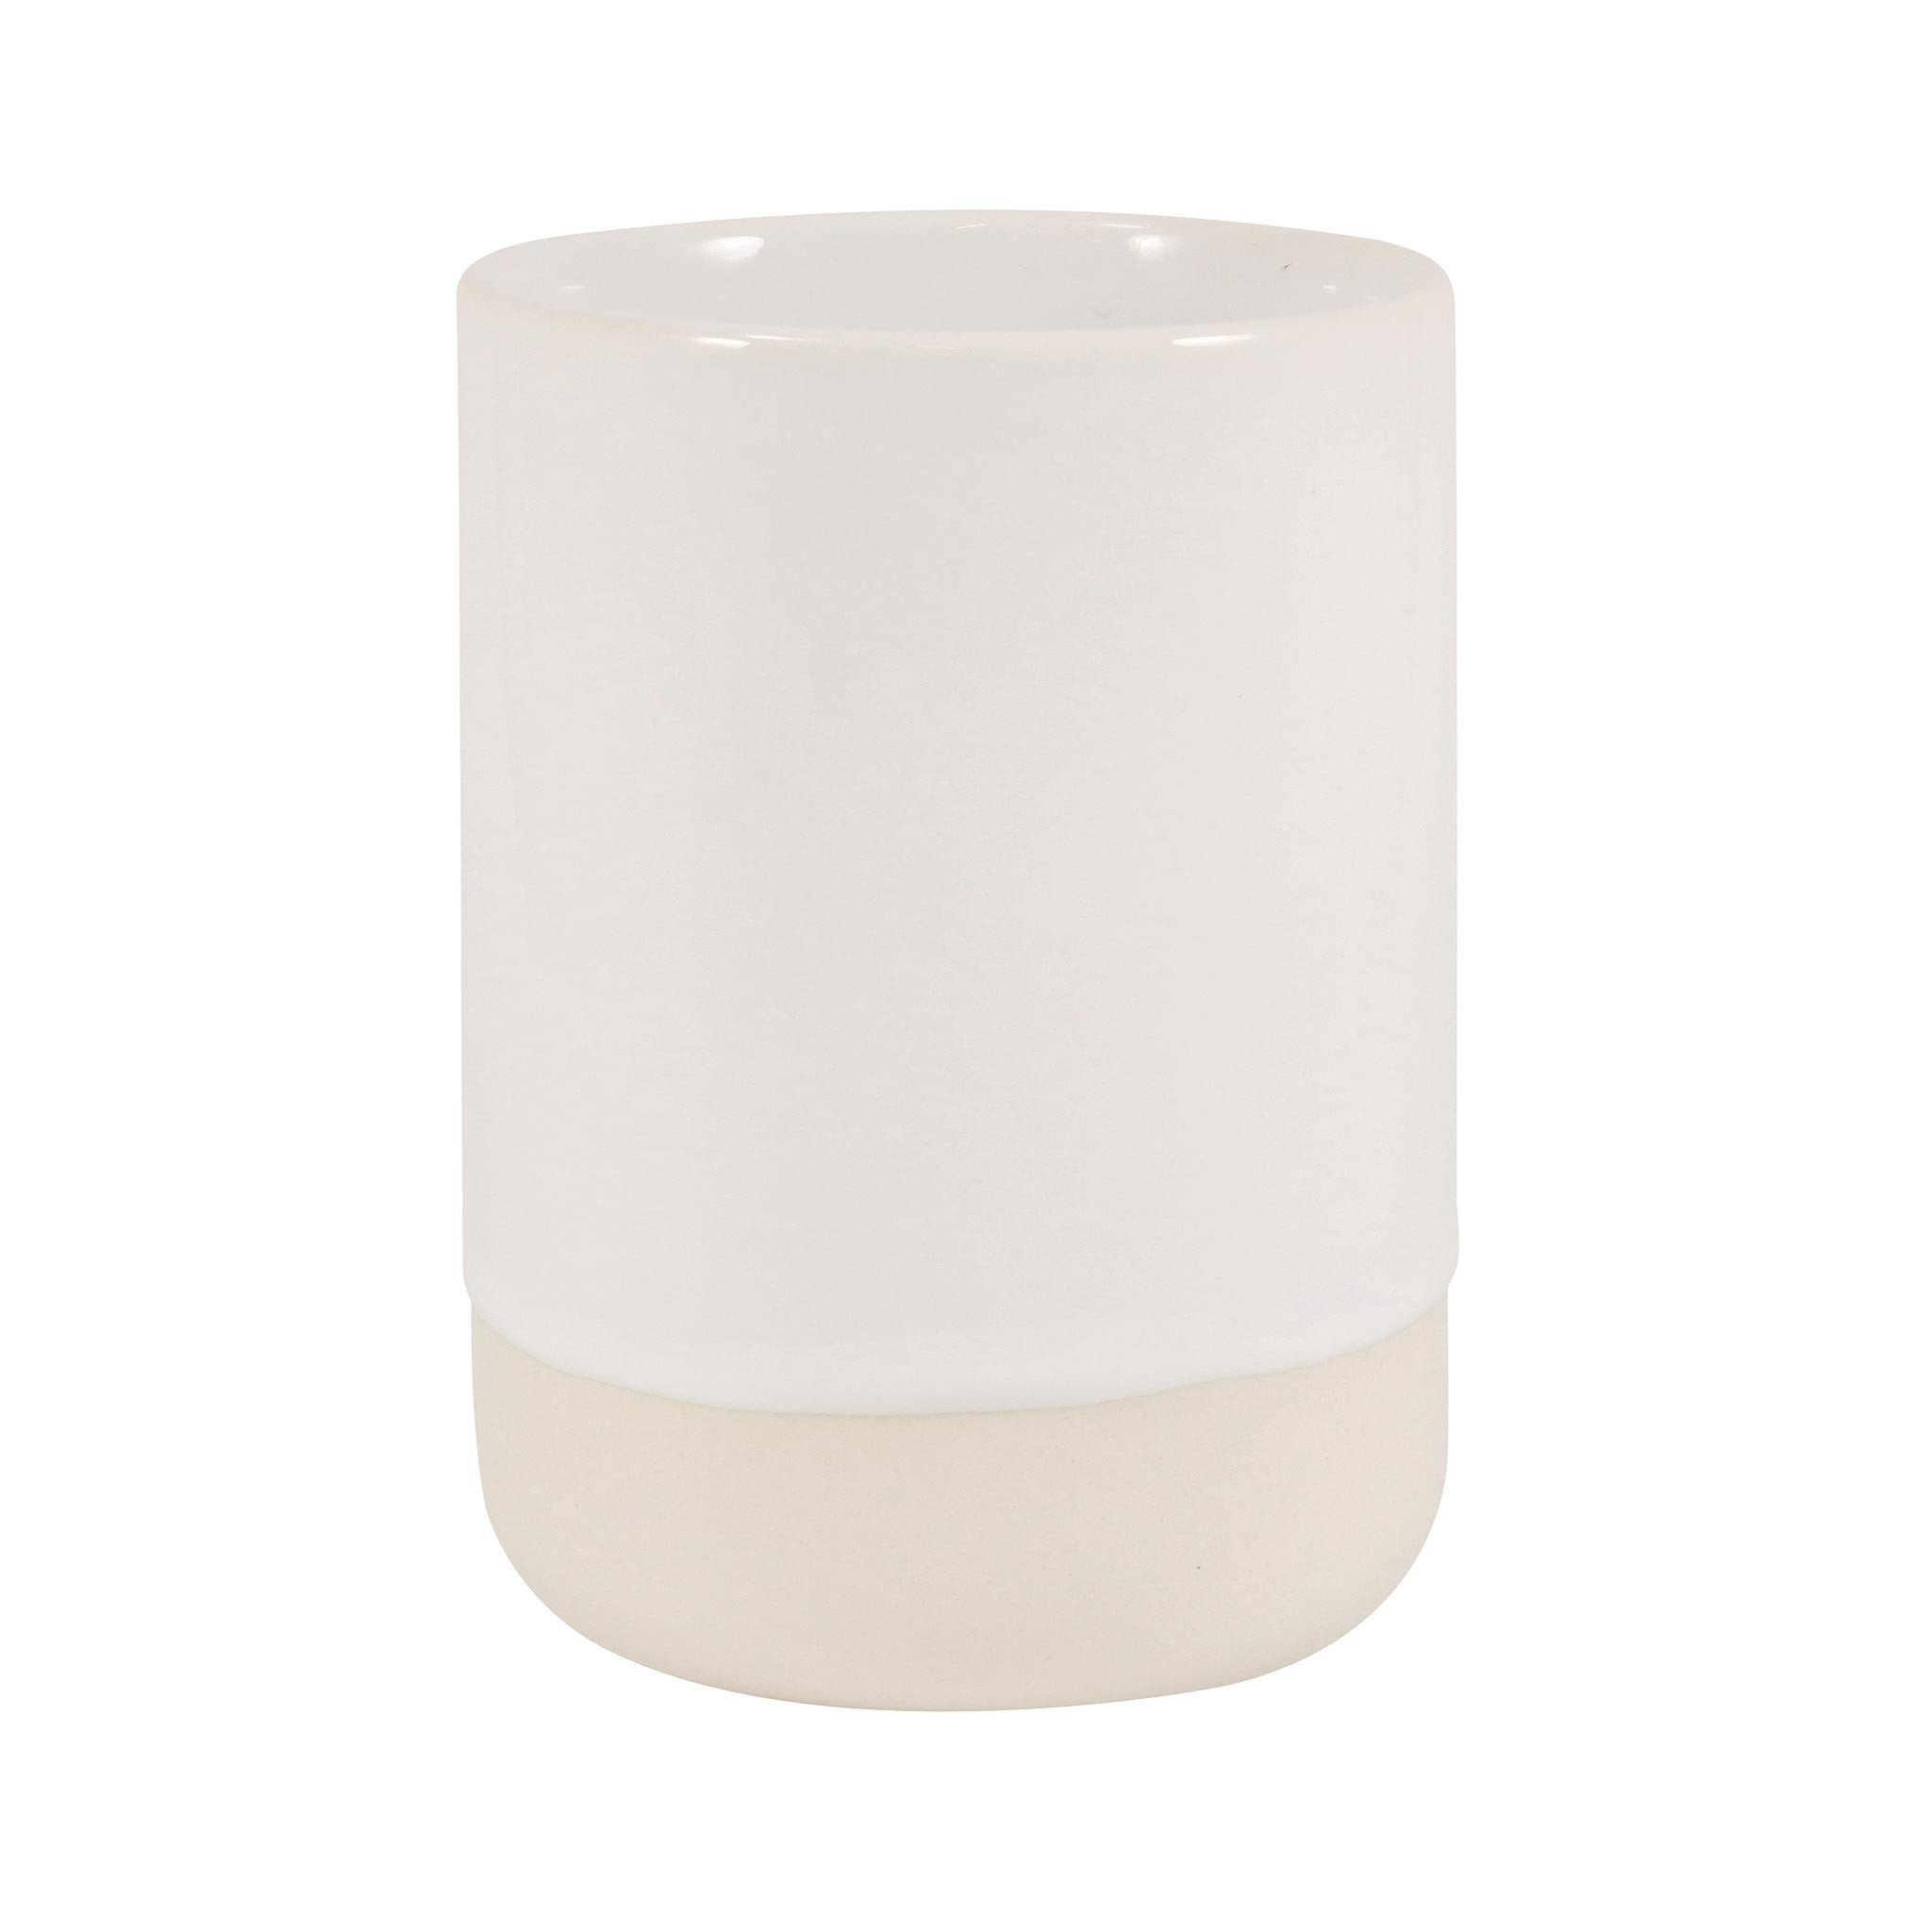 Studio Arhoj Slurp Cup Classic White